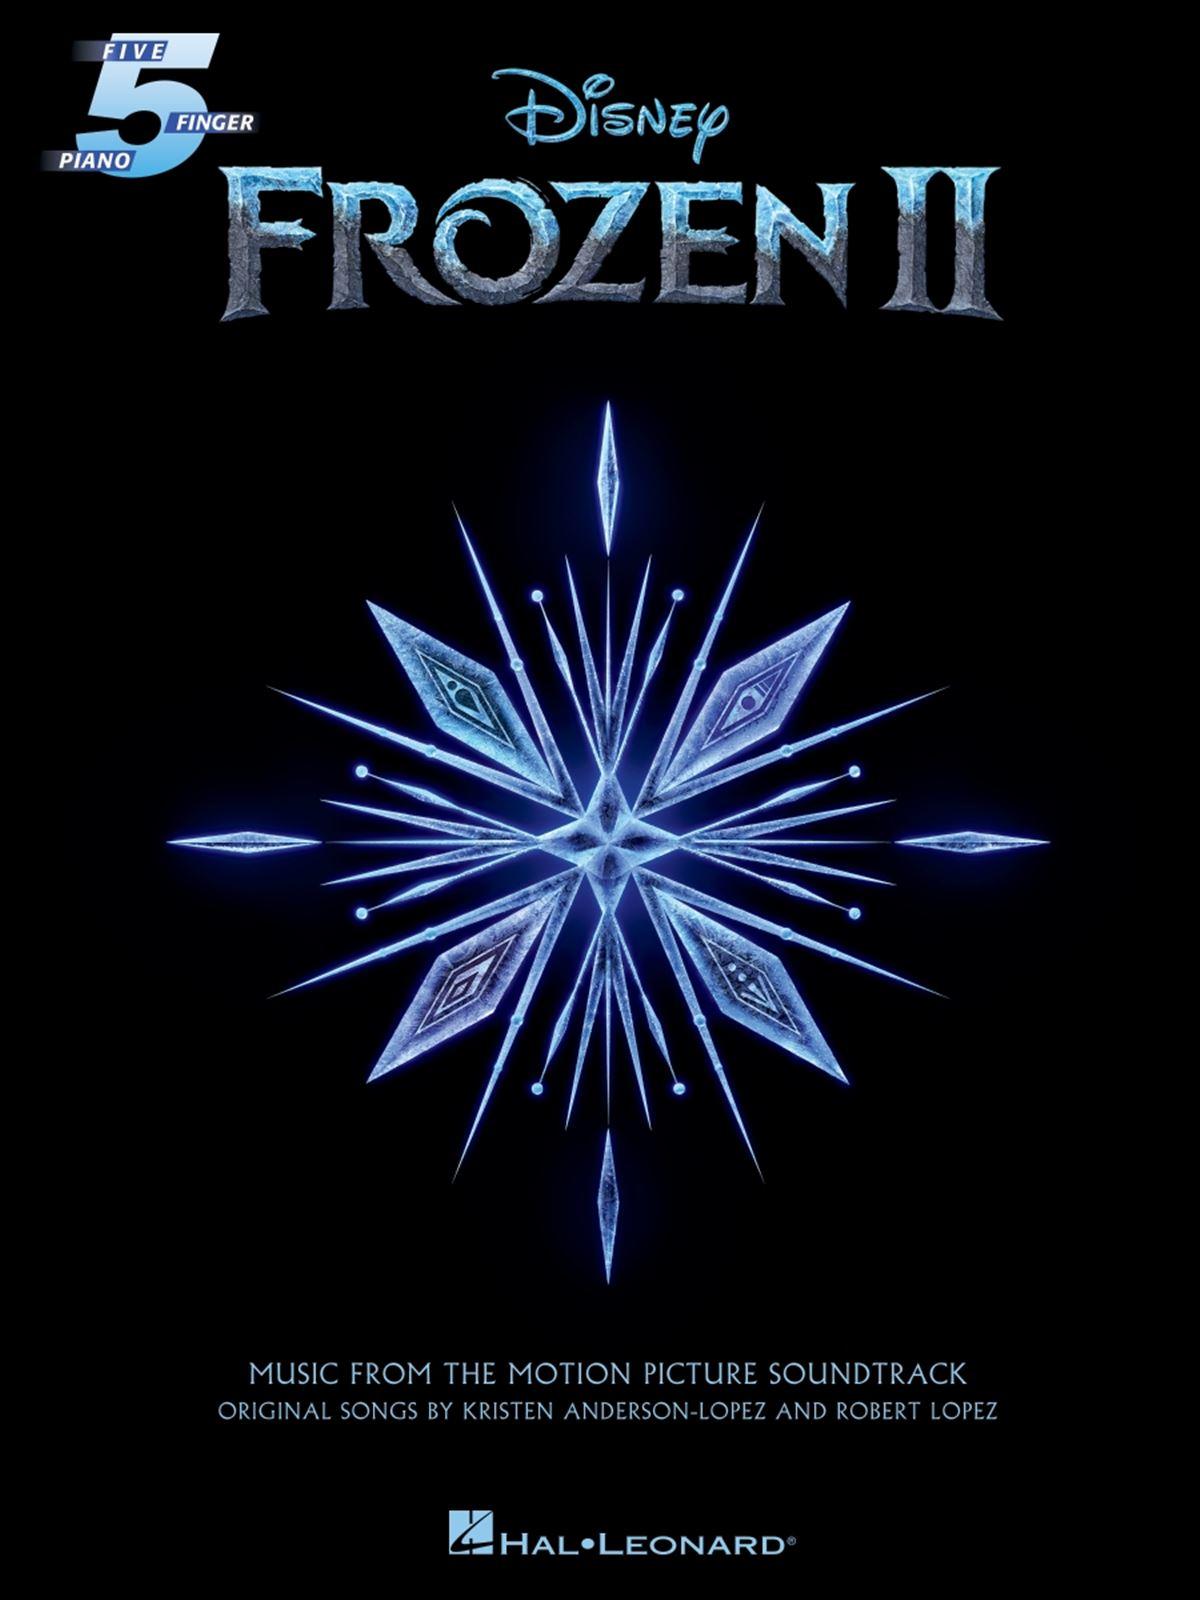 Robert Lopez Kristen Anderson-Lopez: Frozen II - Five Finger Piano: Piano Solo: